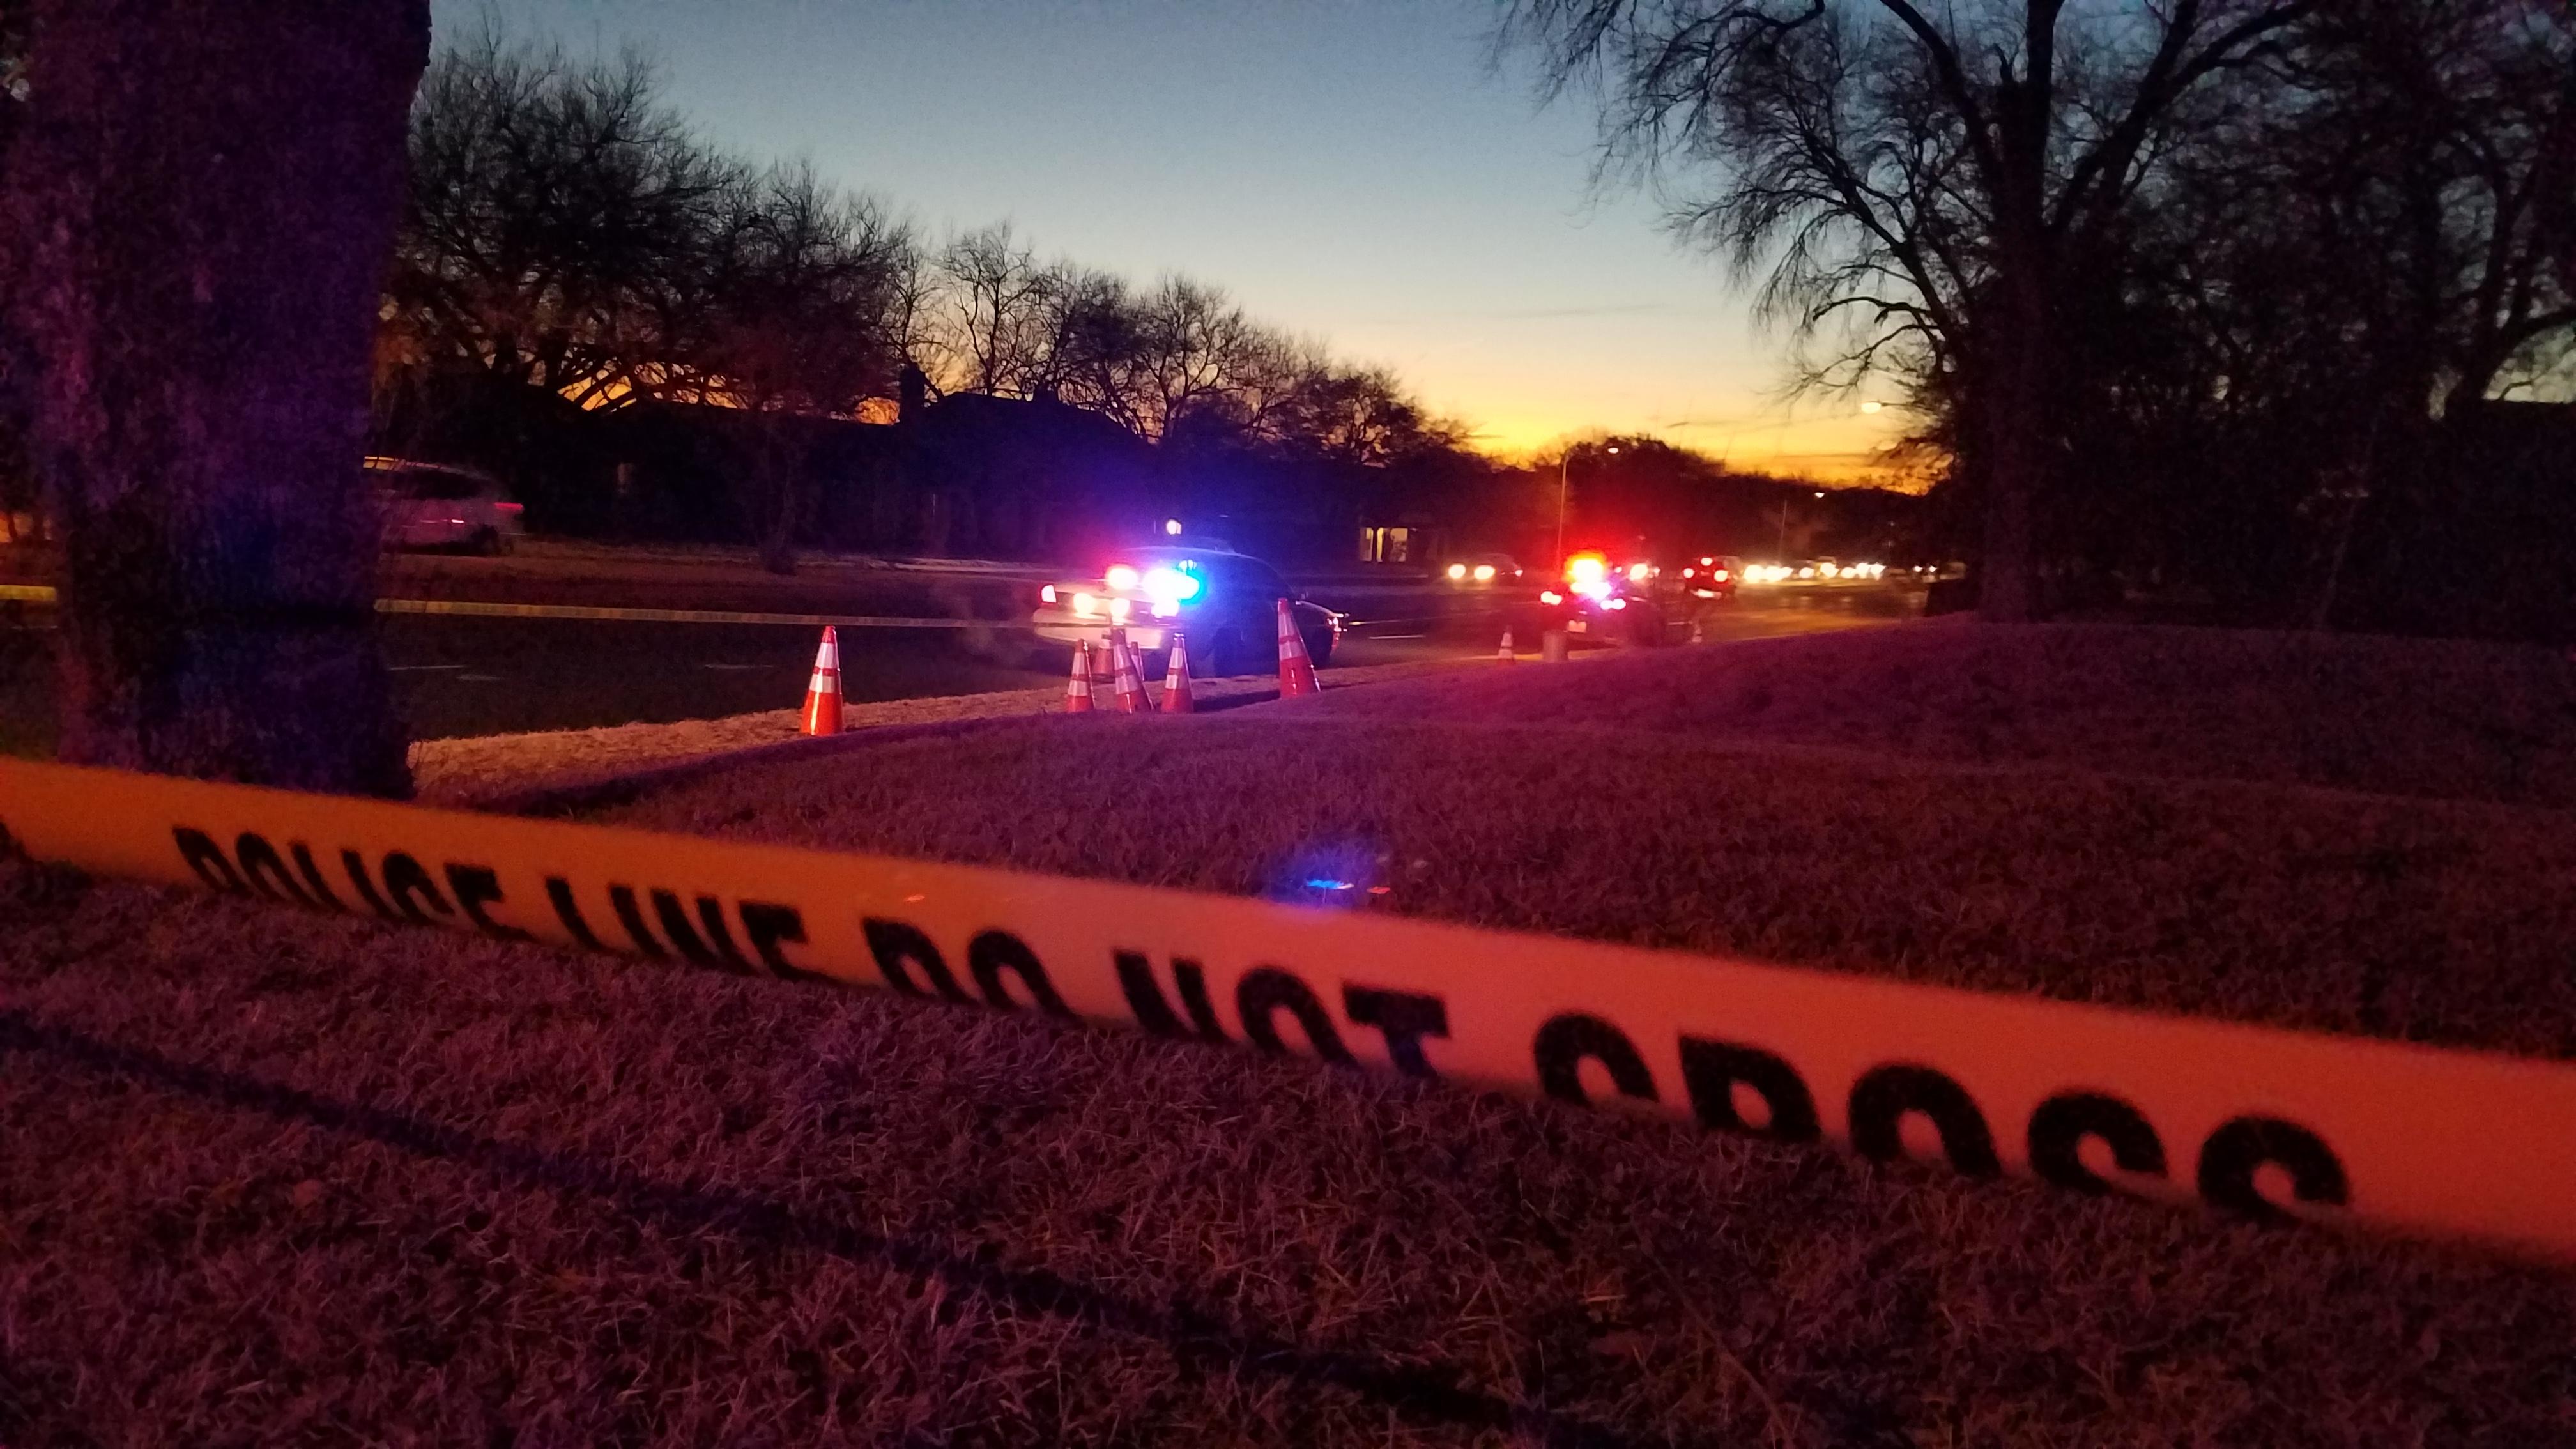 A teen was shot in north Austin Jan. 25, 2018 (KXAN Photo/Chris Davis)